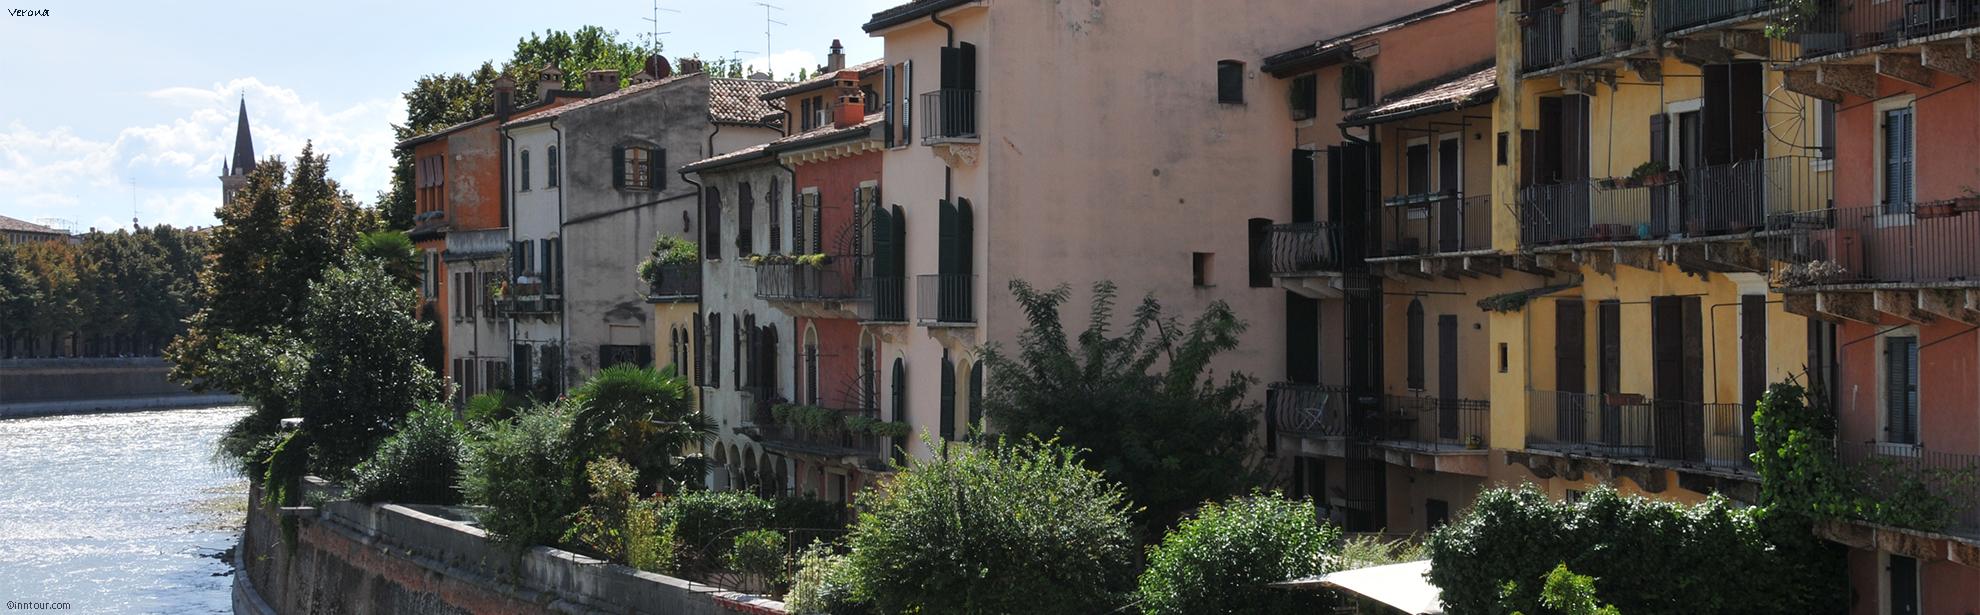 Oklassinntour_Verona_DSC_1005